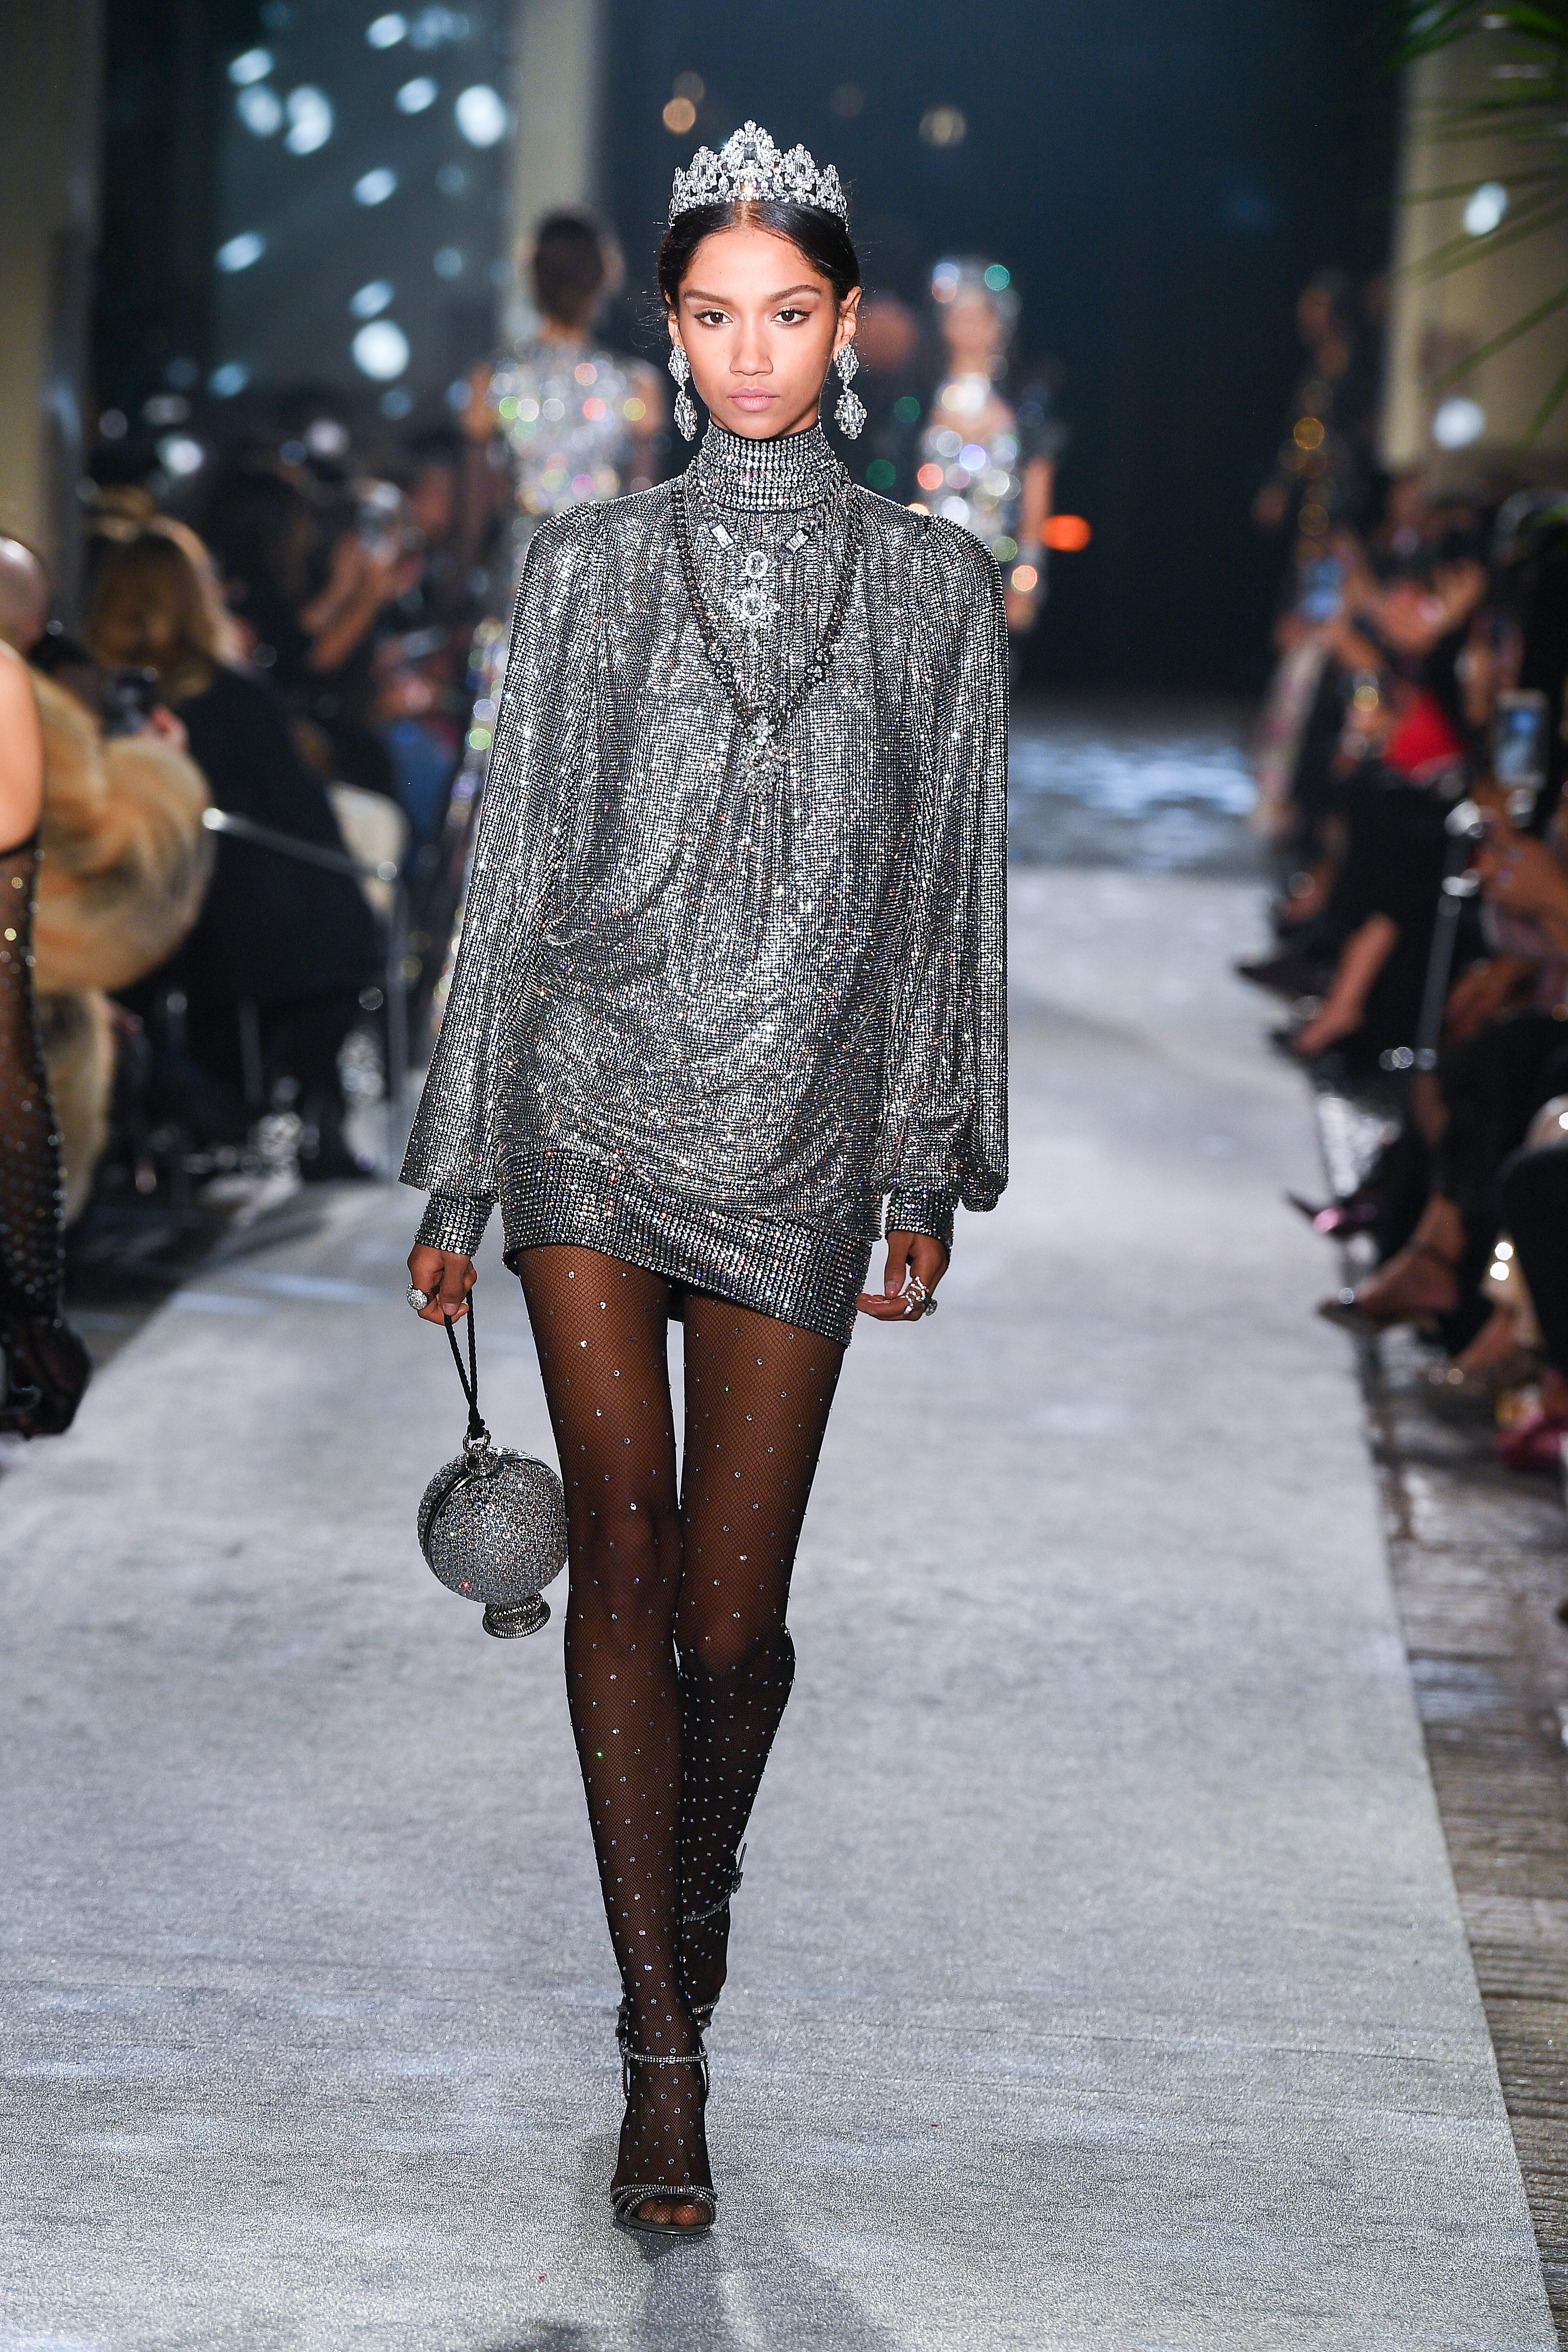 Dolce & Gabbana: Secrets & Diamonds